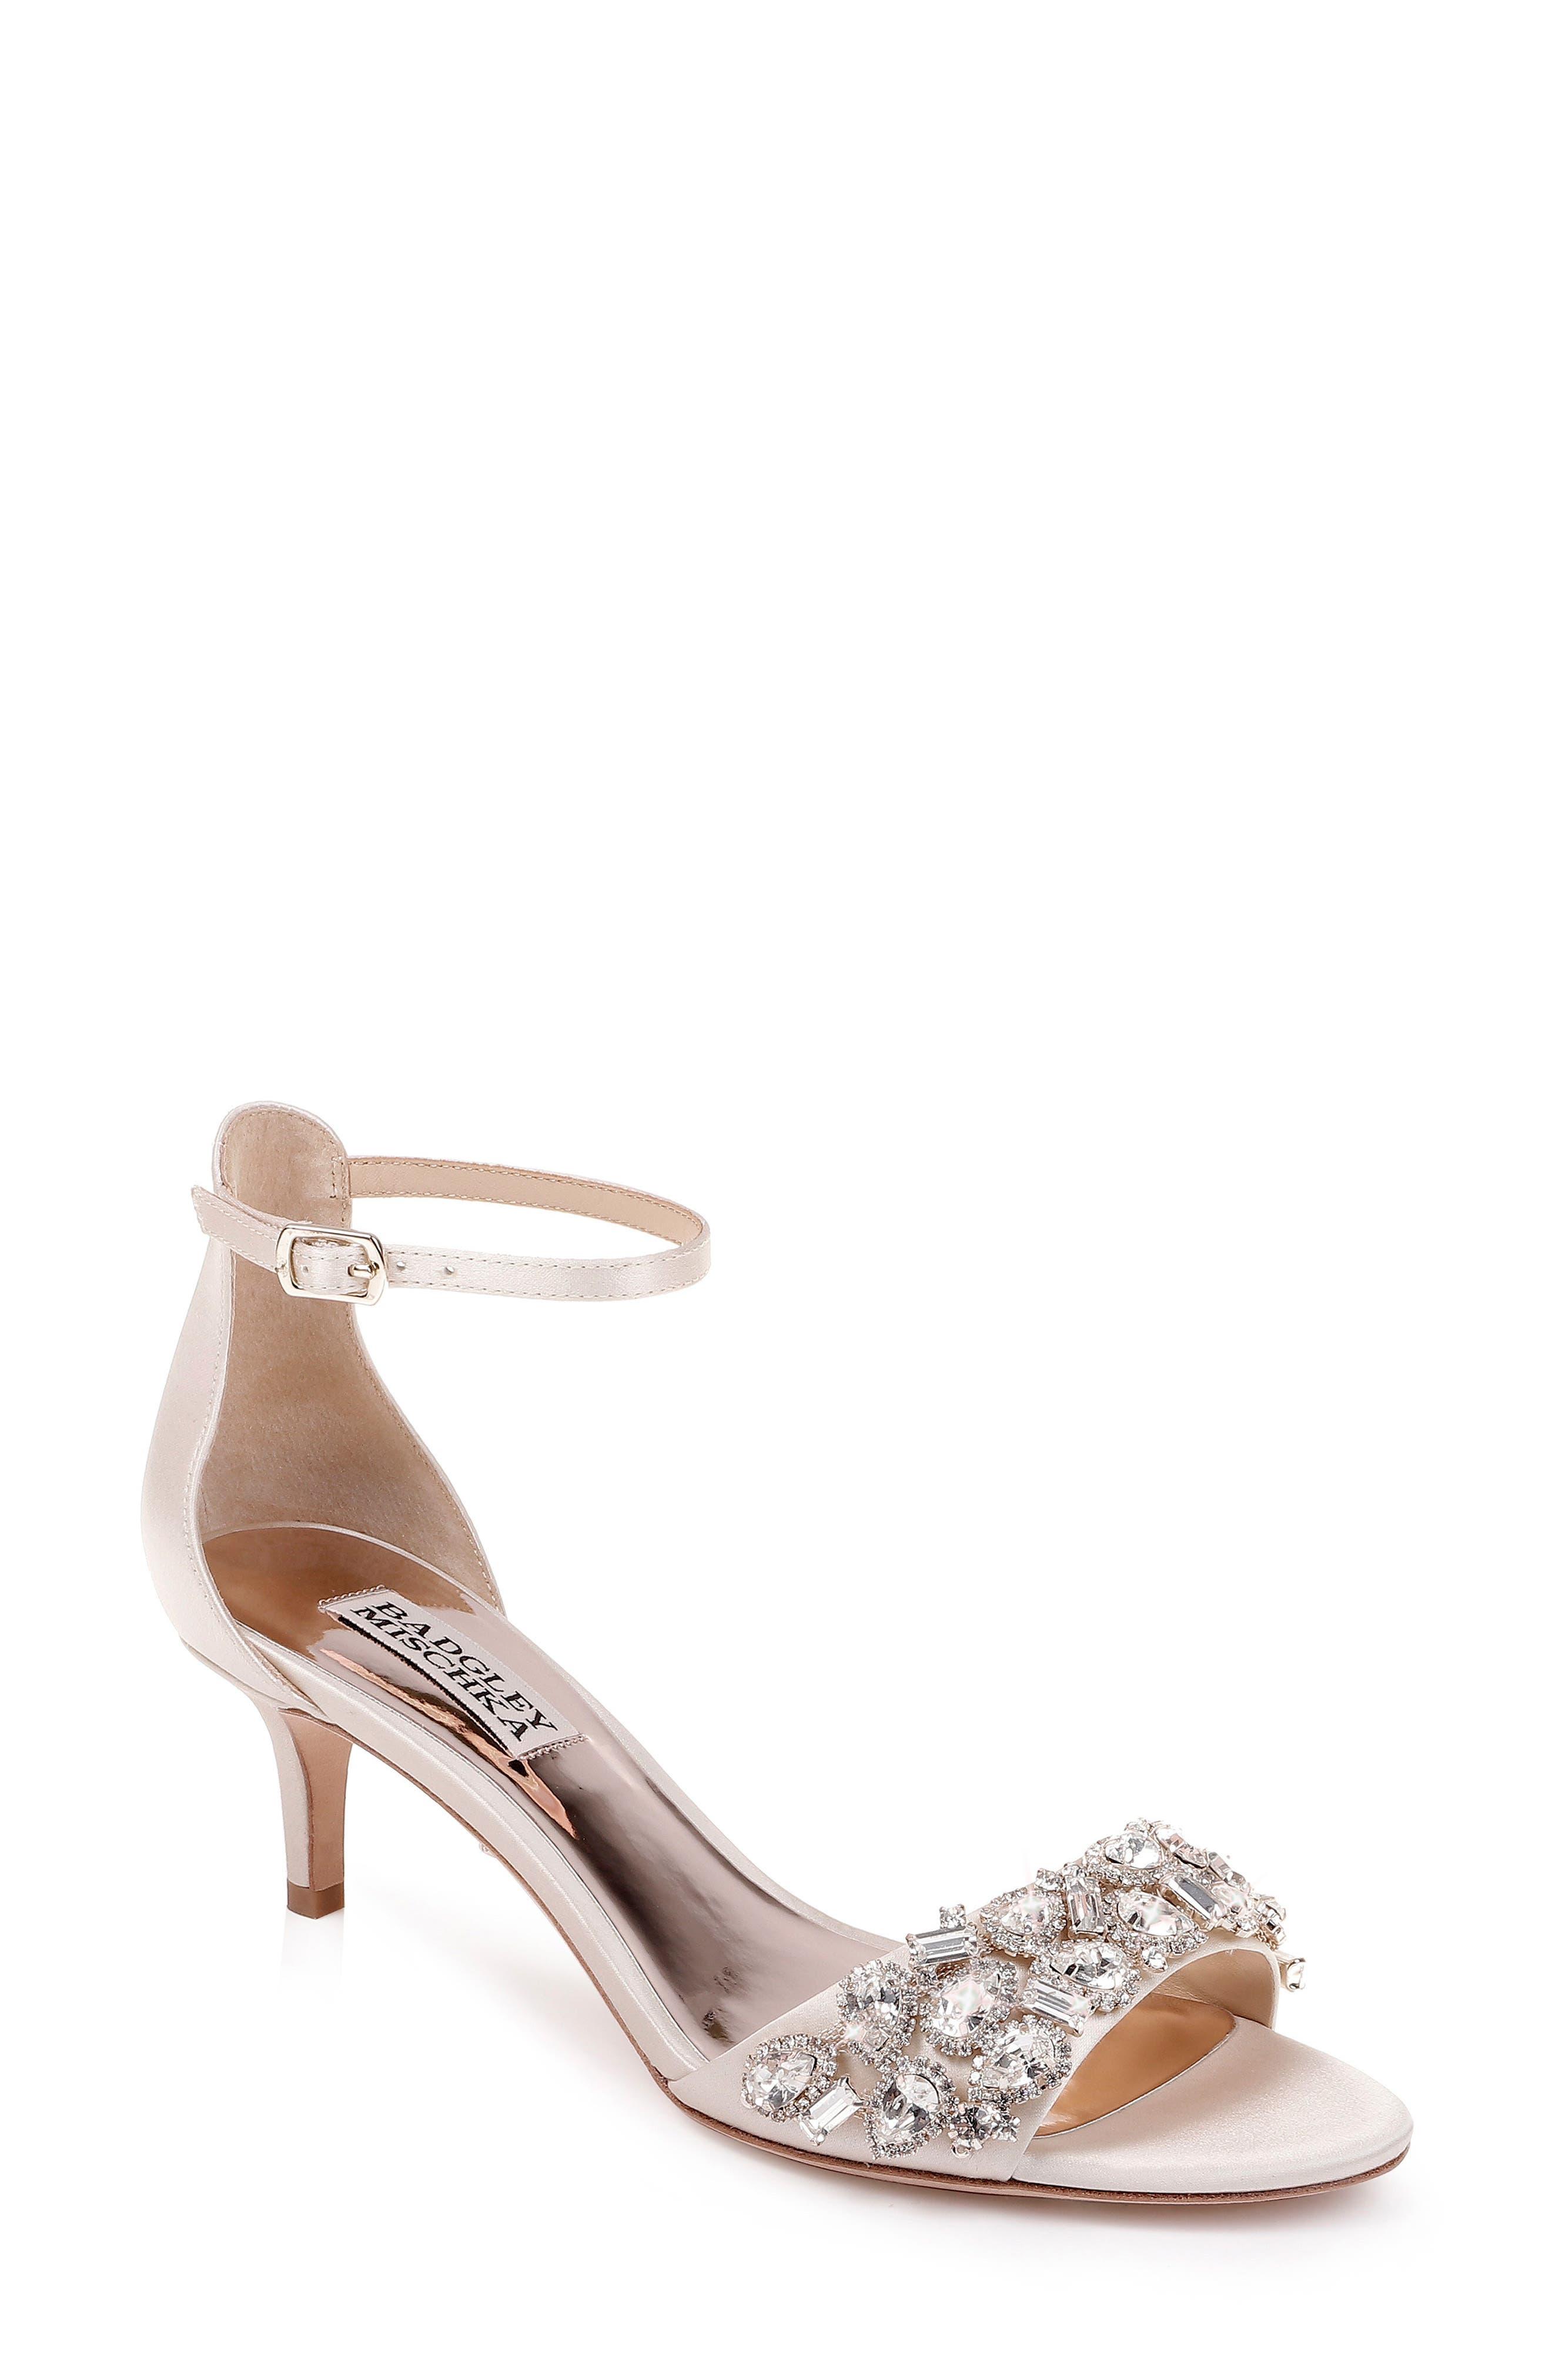 f9dfb5ea639 Badgley Mischka Lara Crystal Embellished Sandal- Ivory